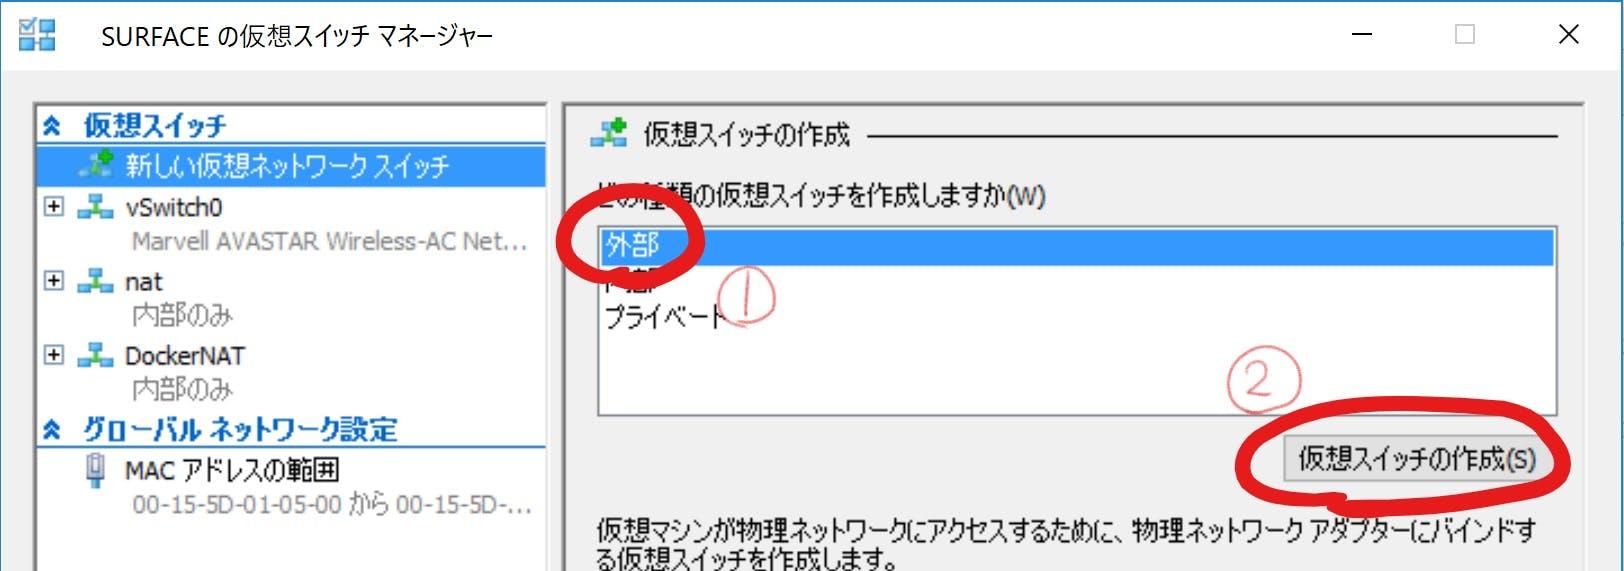 Inkedキャプチャ2_LI.jpg